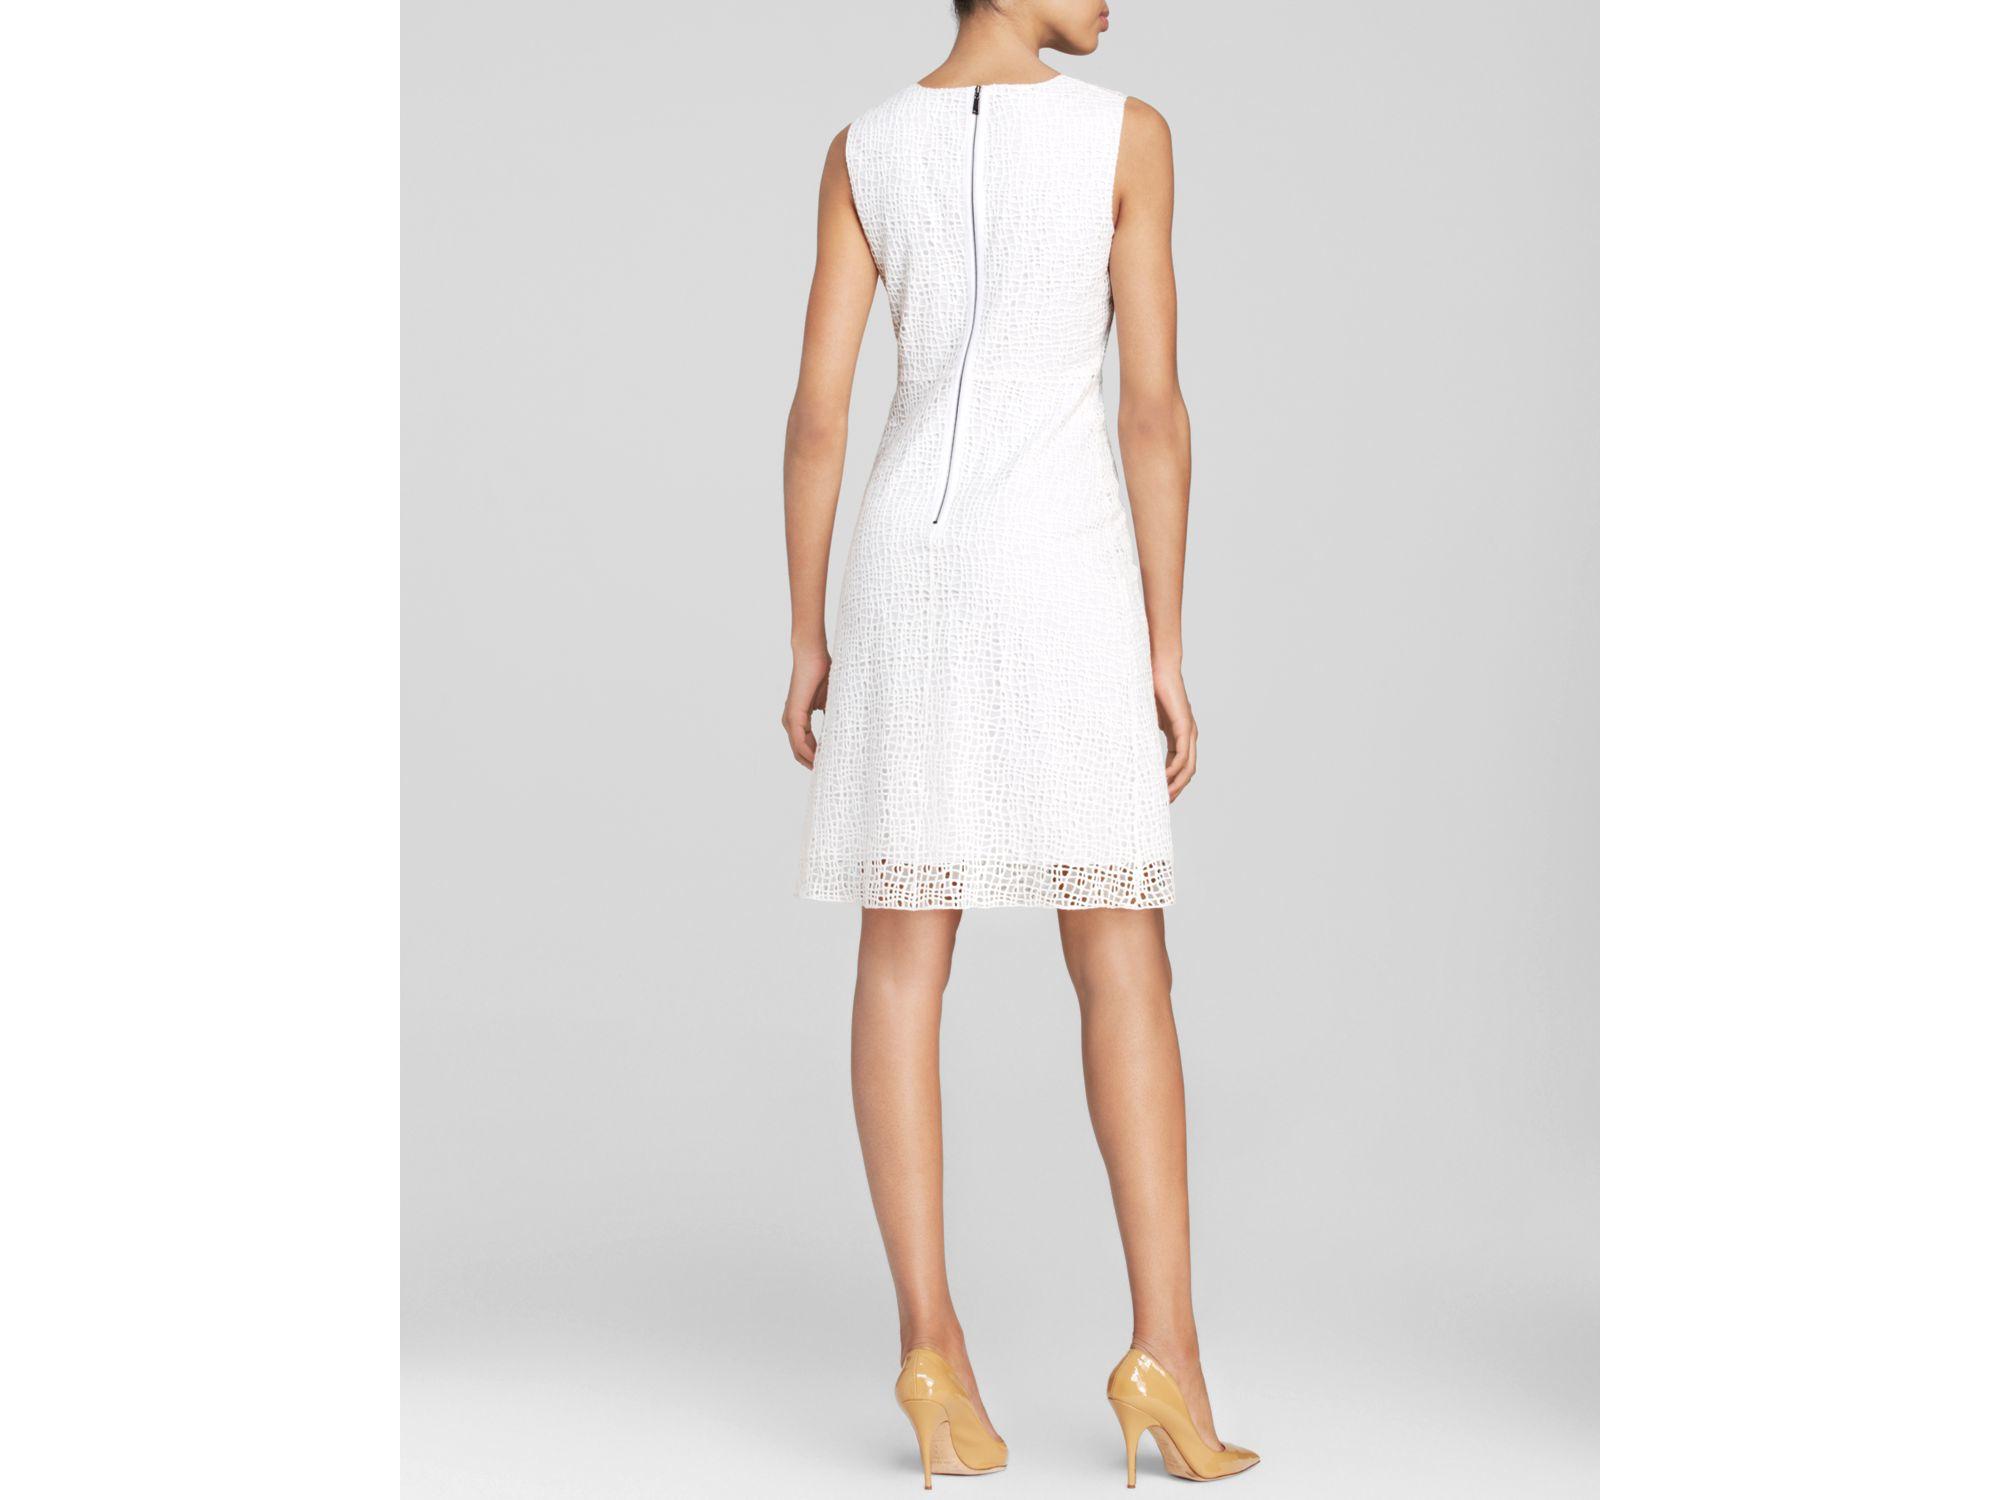 49d08aa1 Elie Tahari Dress - Ophelia Sleeveless Lace in White - Lyst